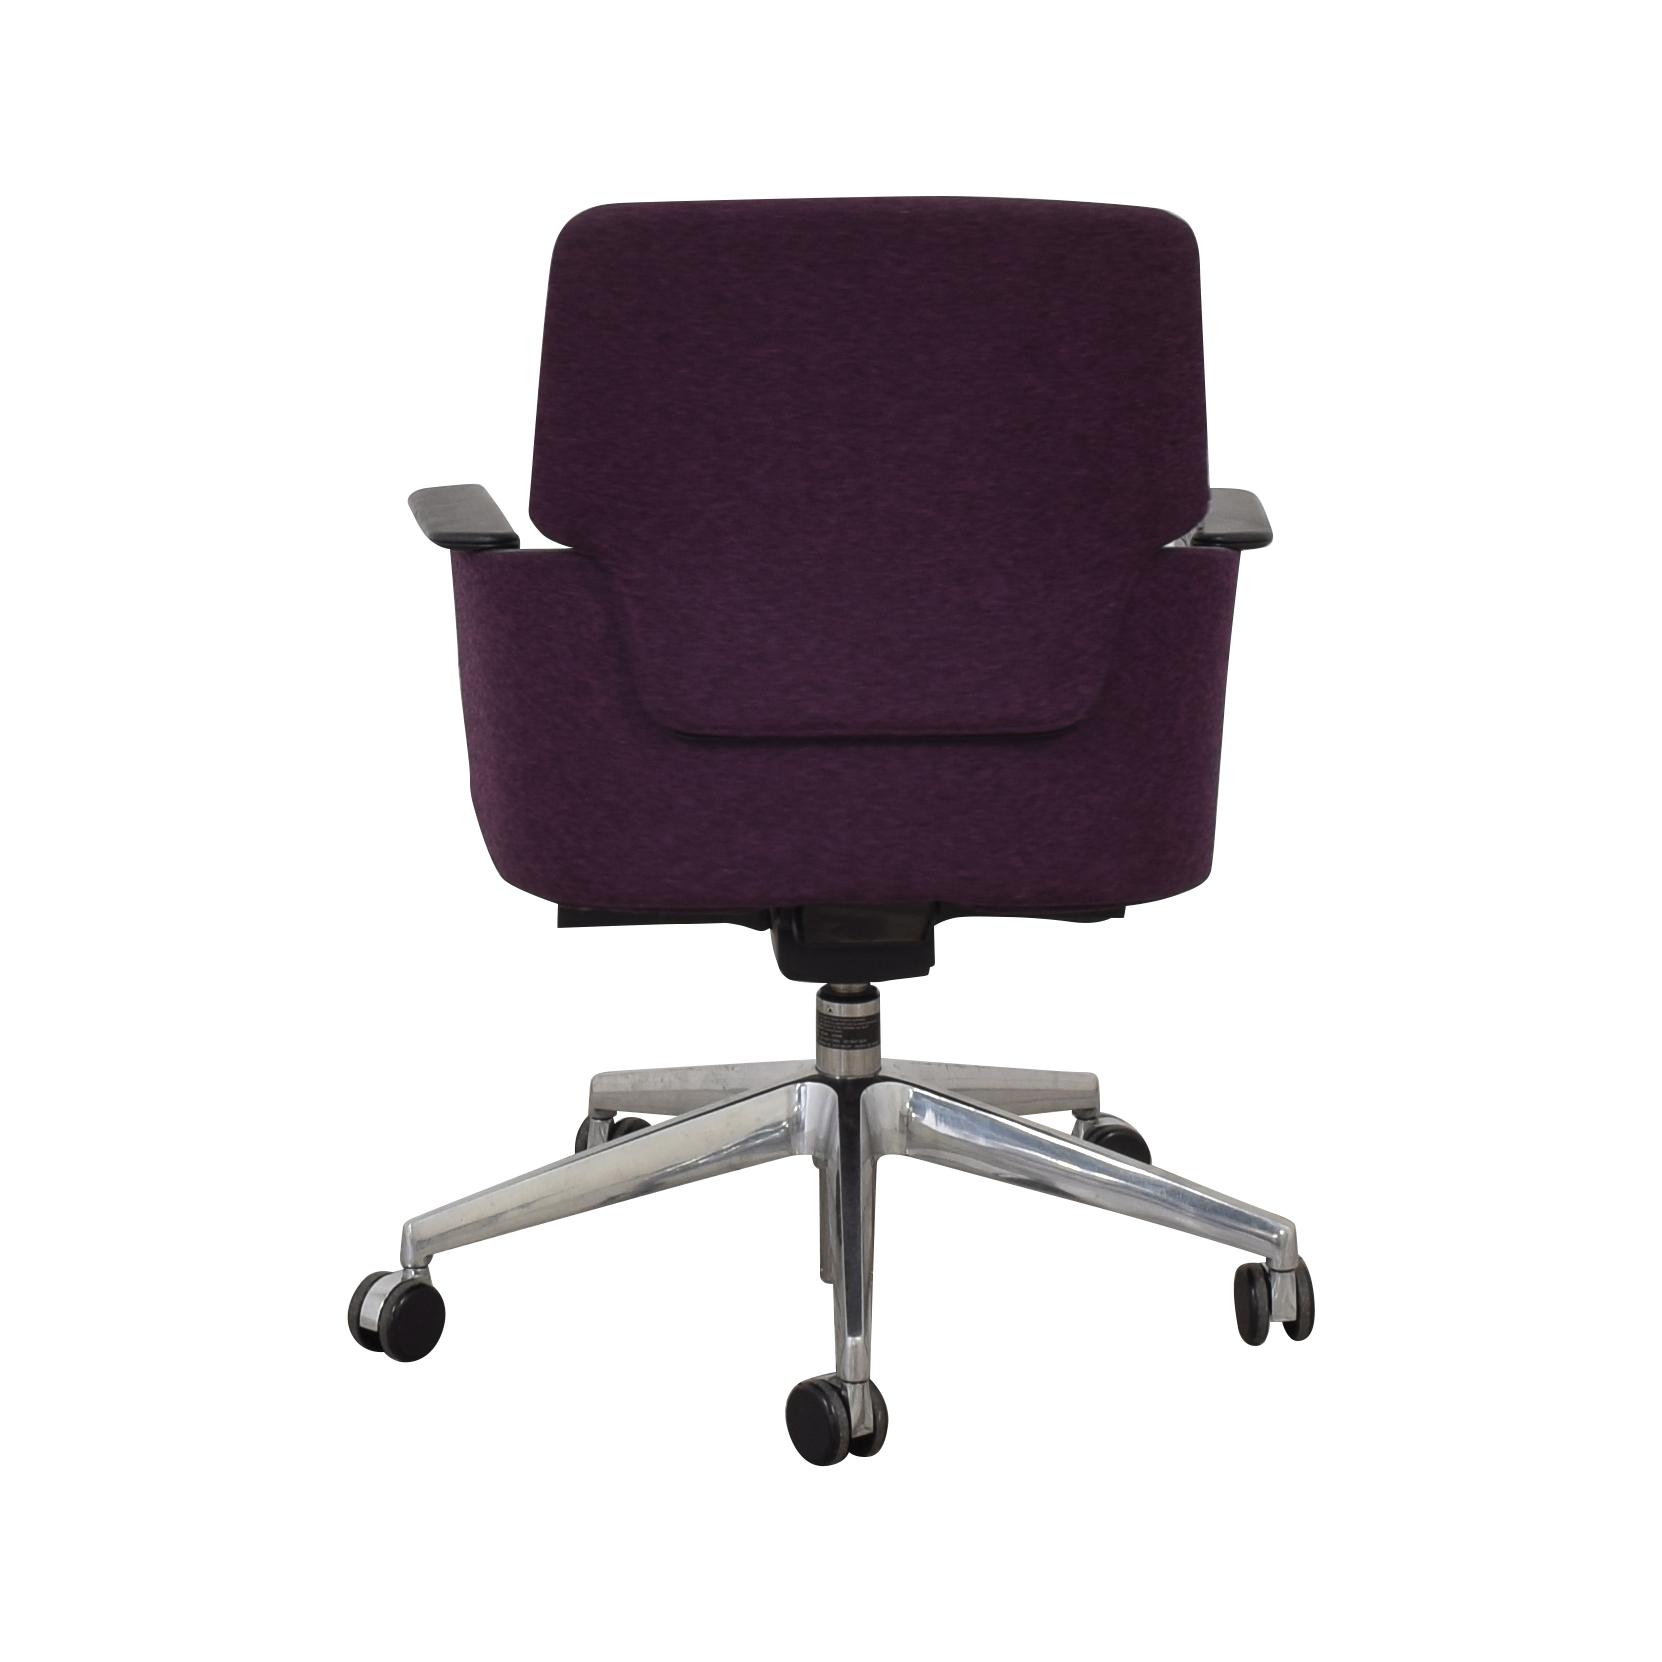 Koleksiyon Koleksiyon Tola Task Chair purple